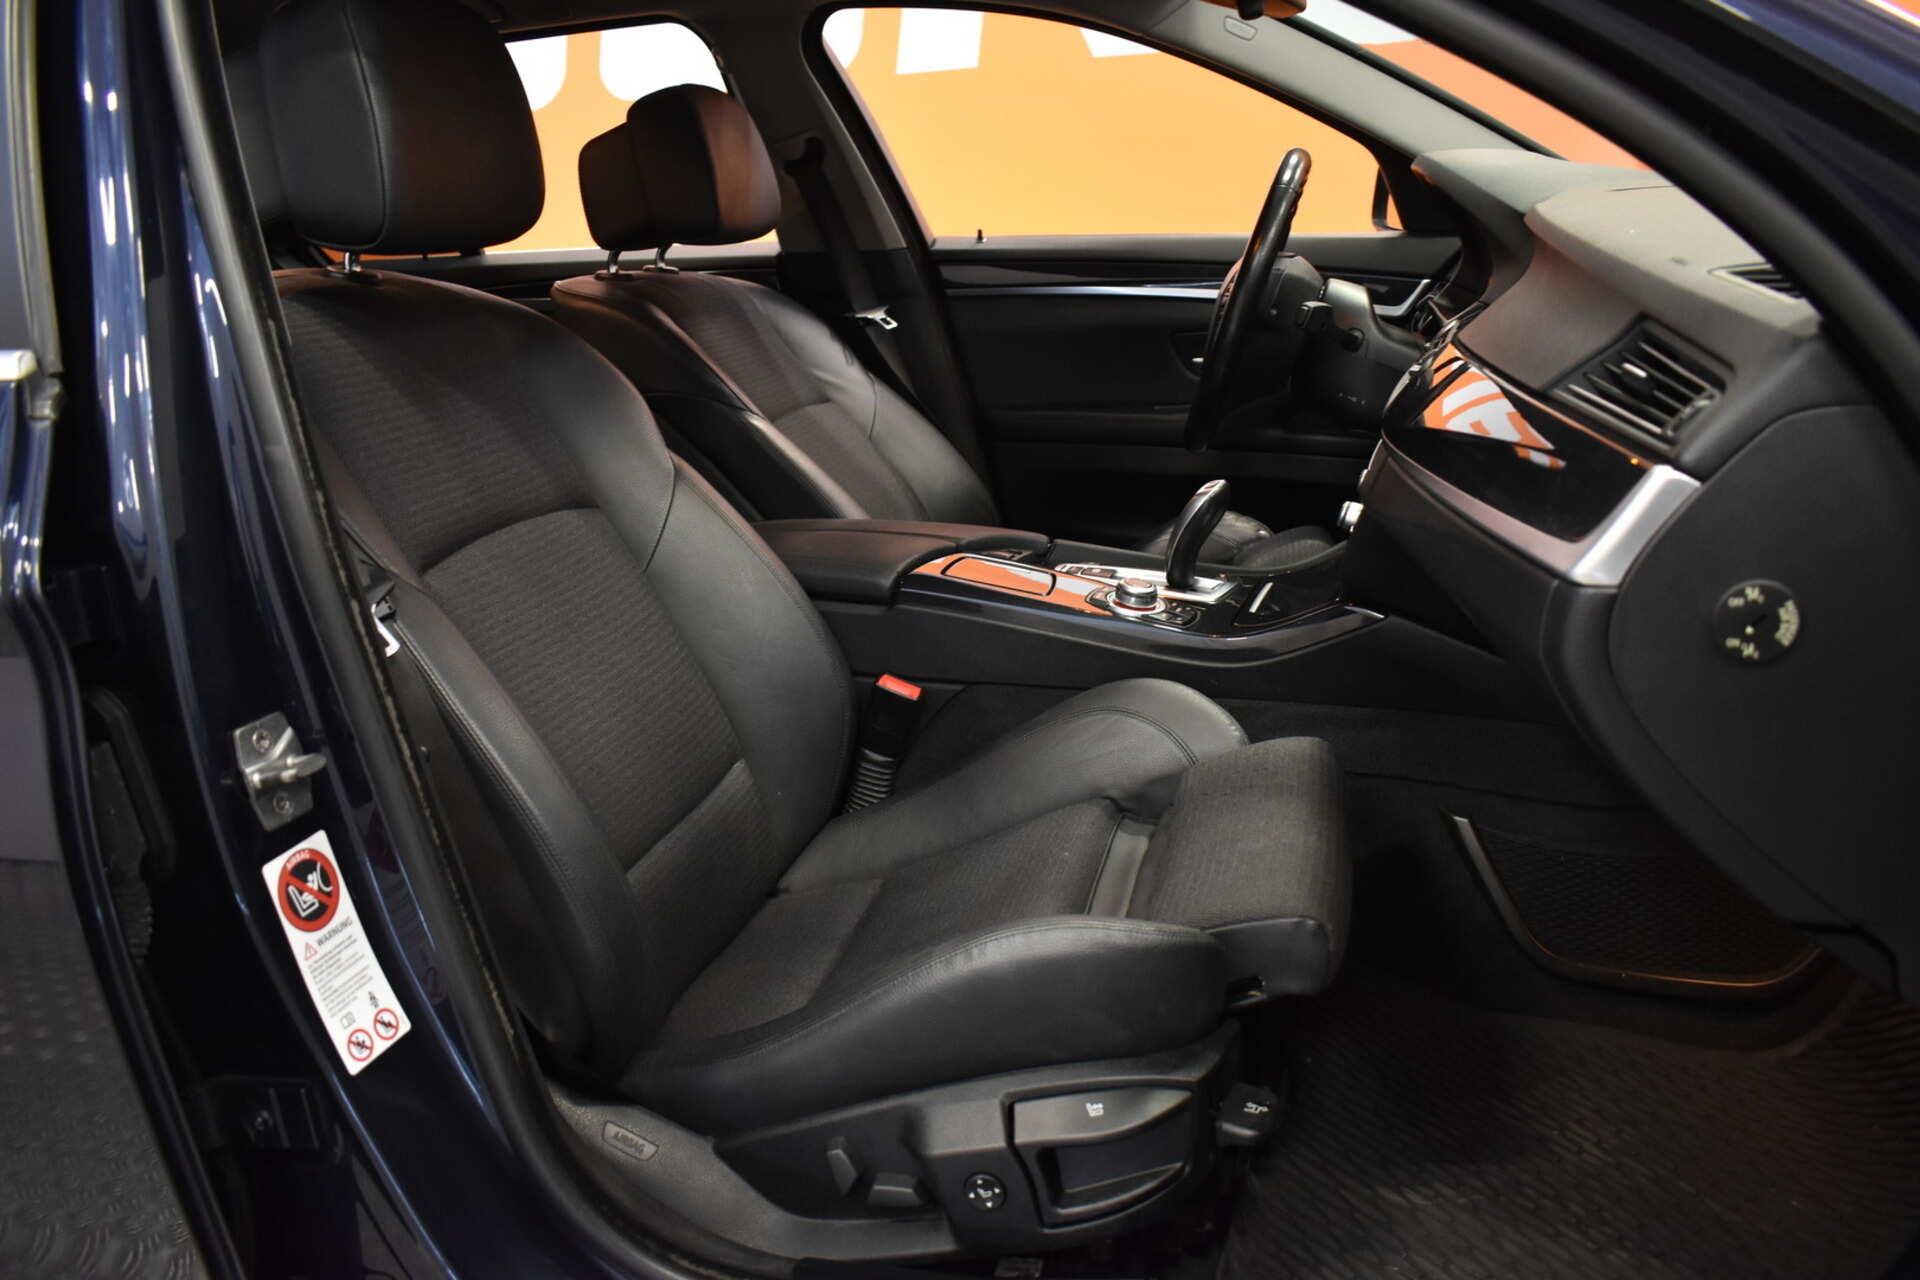 BMW 520 - 113645 - kuva 11